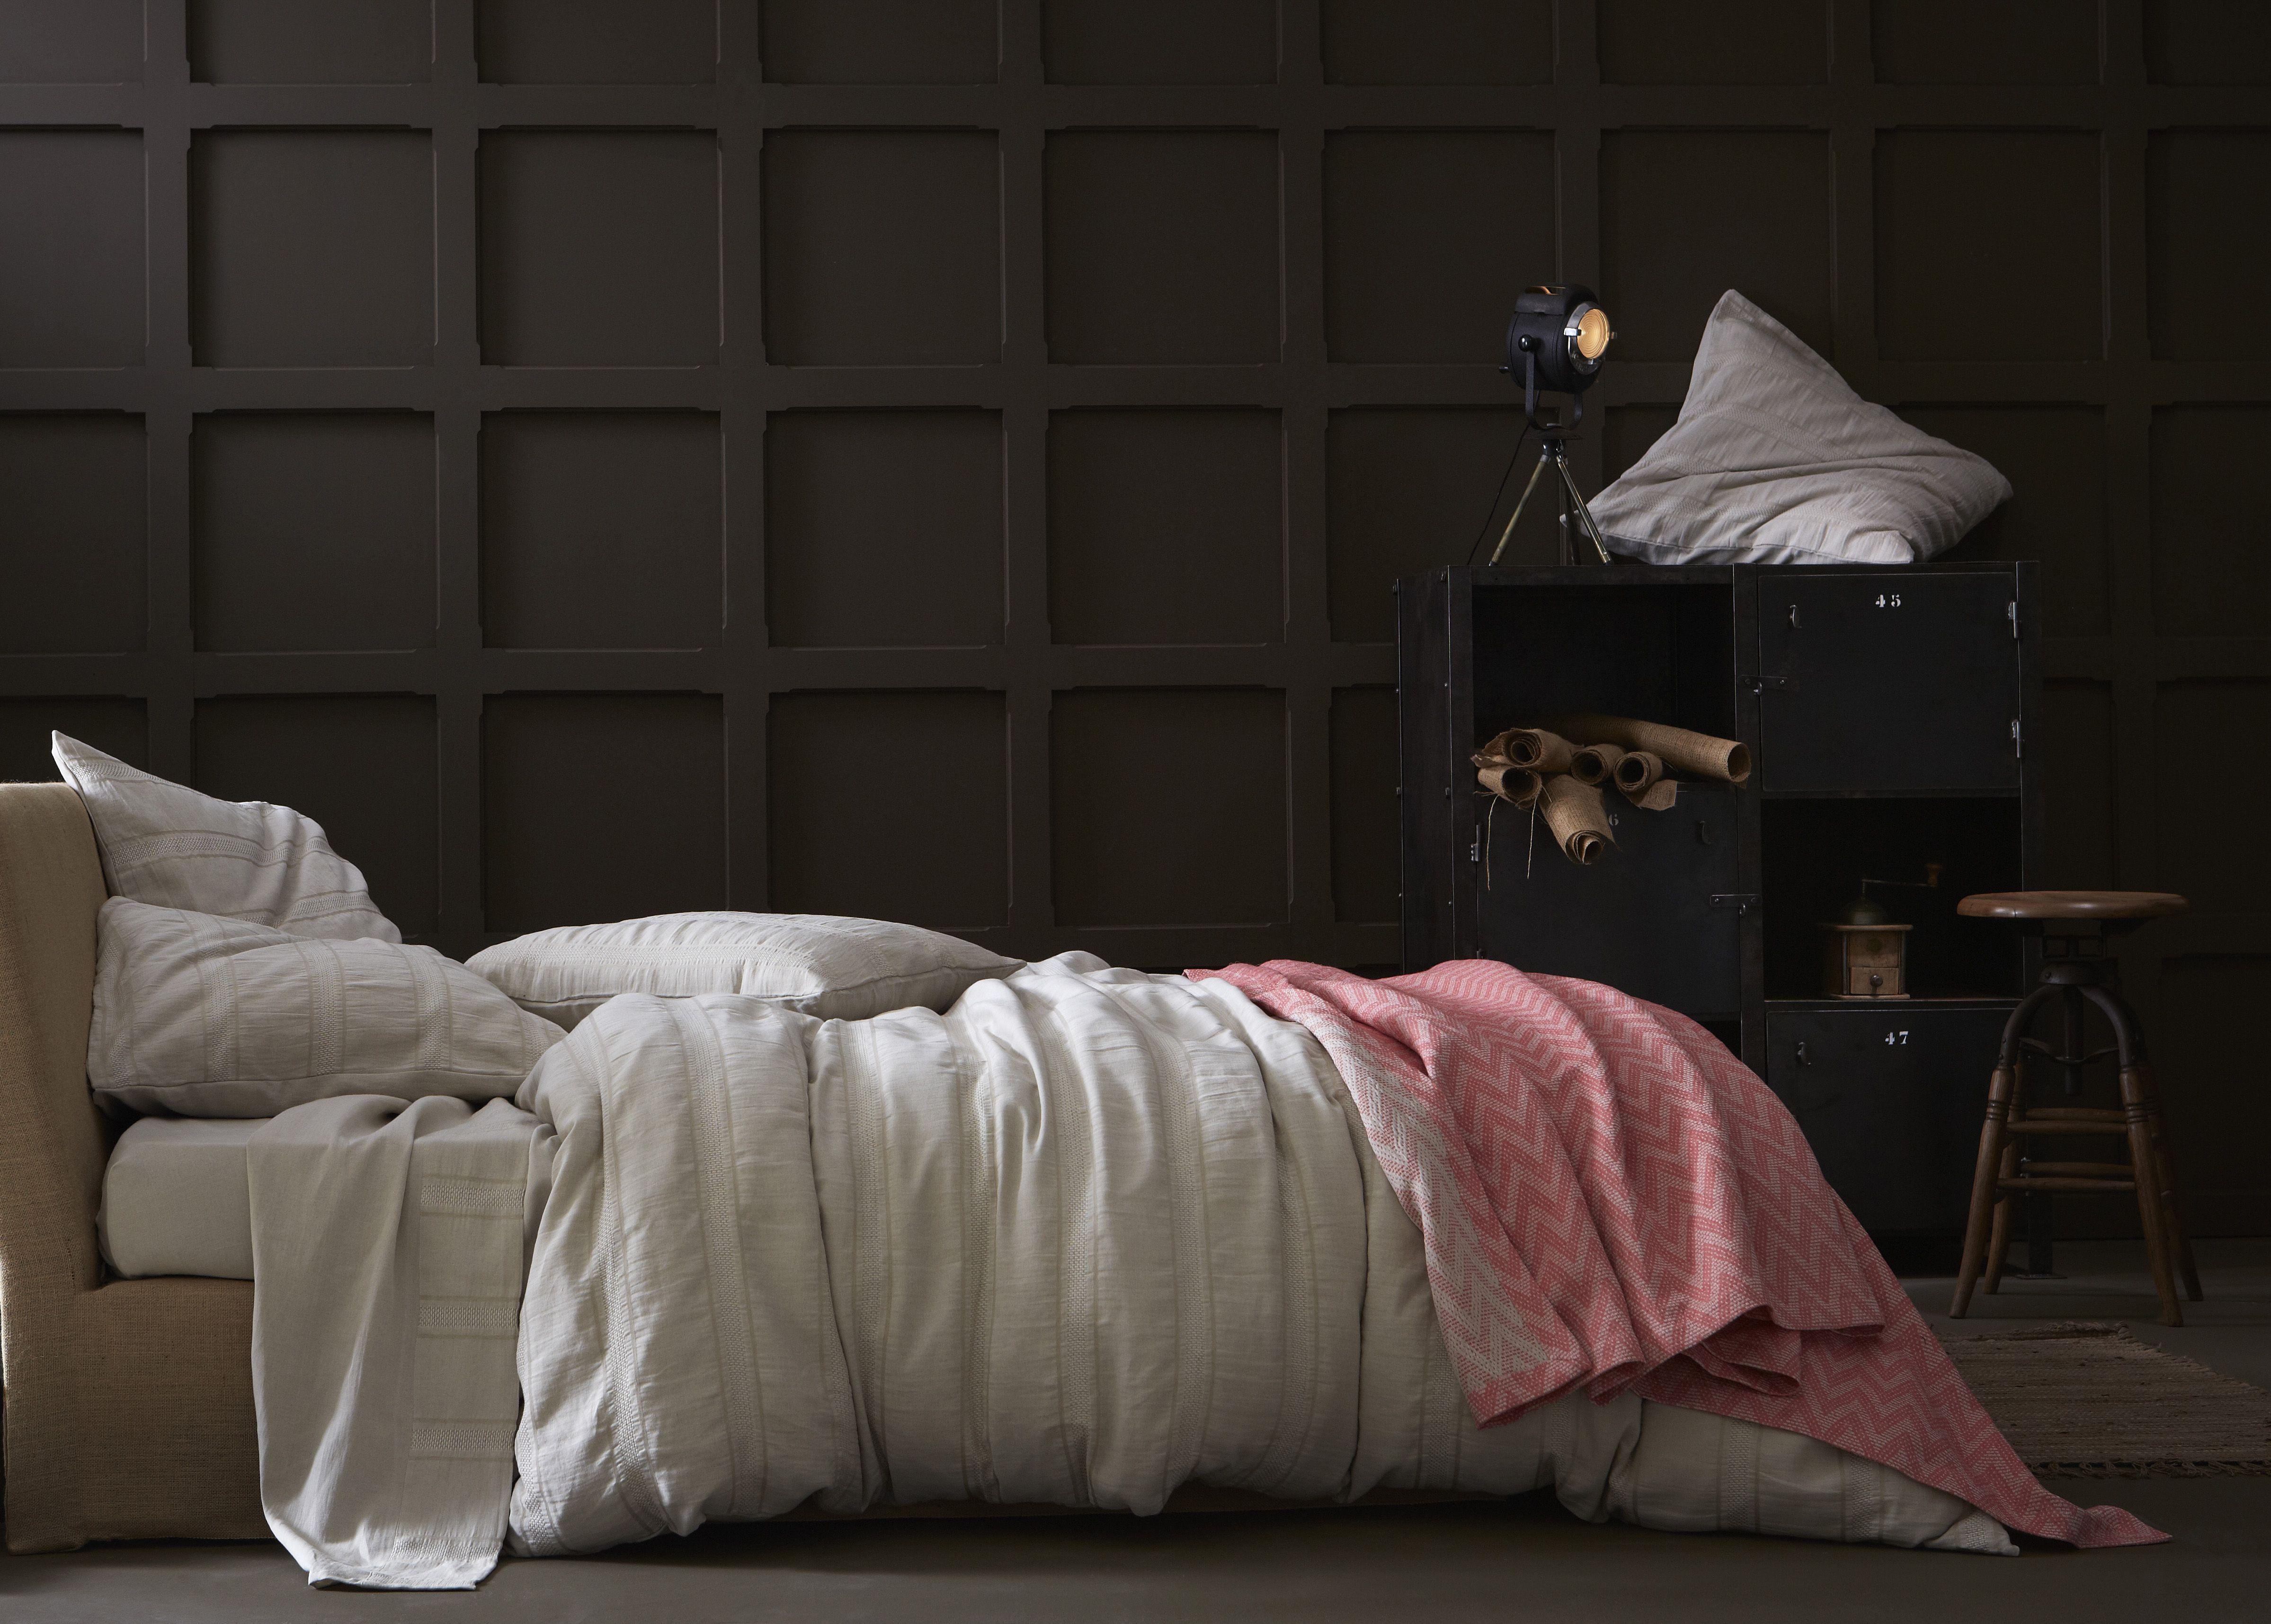 linge de lit essix home collection ESSIX HOME COLLECTION   NOMADE Linge de lit métissé lin   coton  linge de lit essix home collection